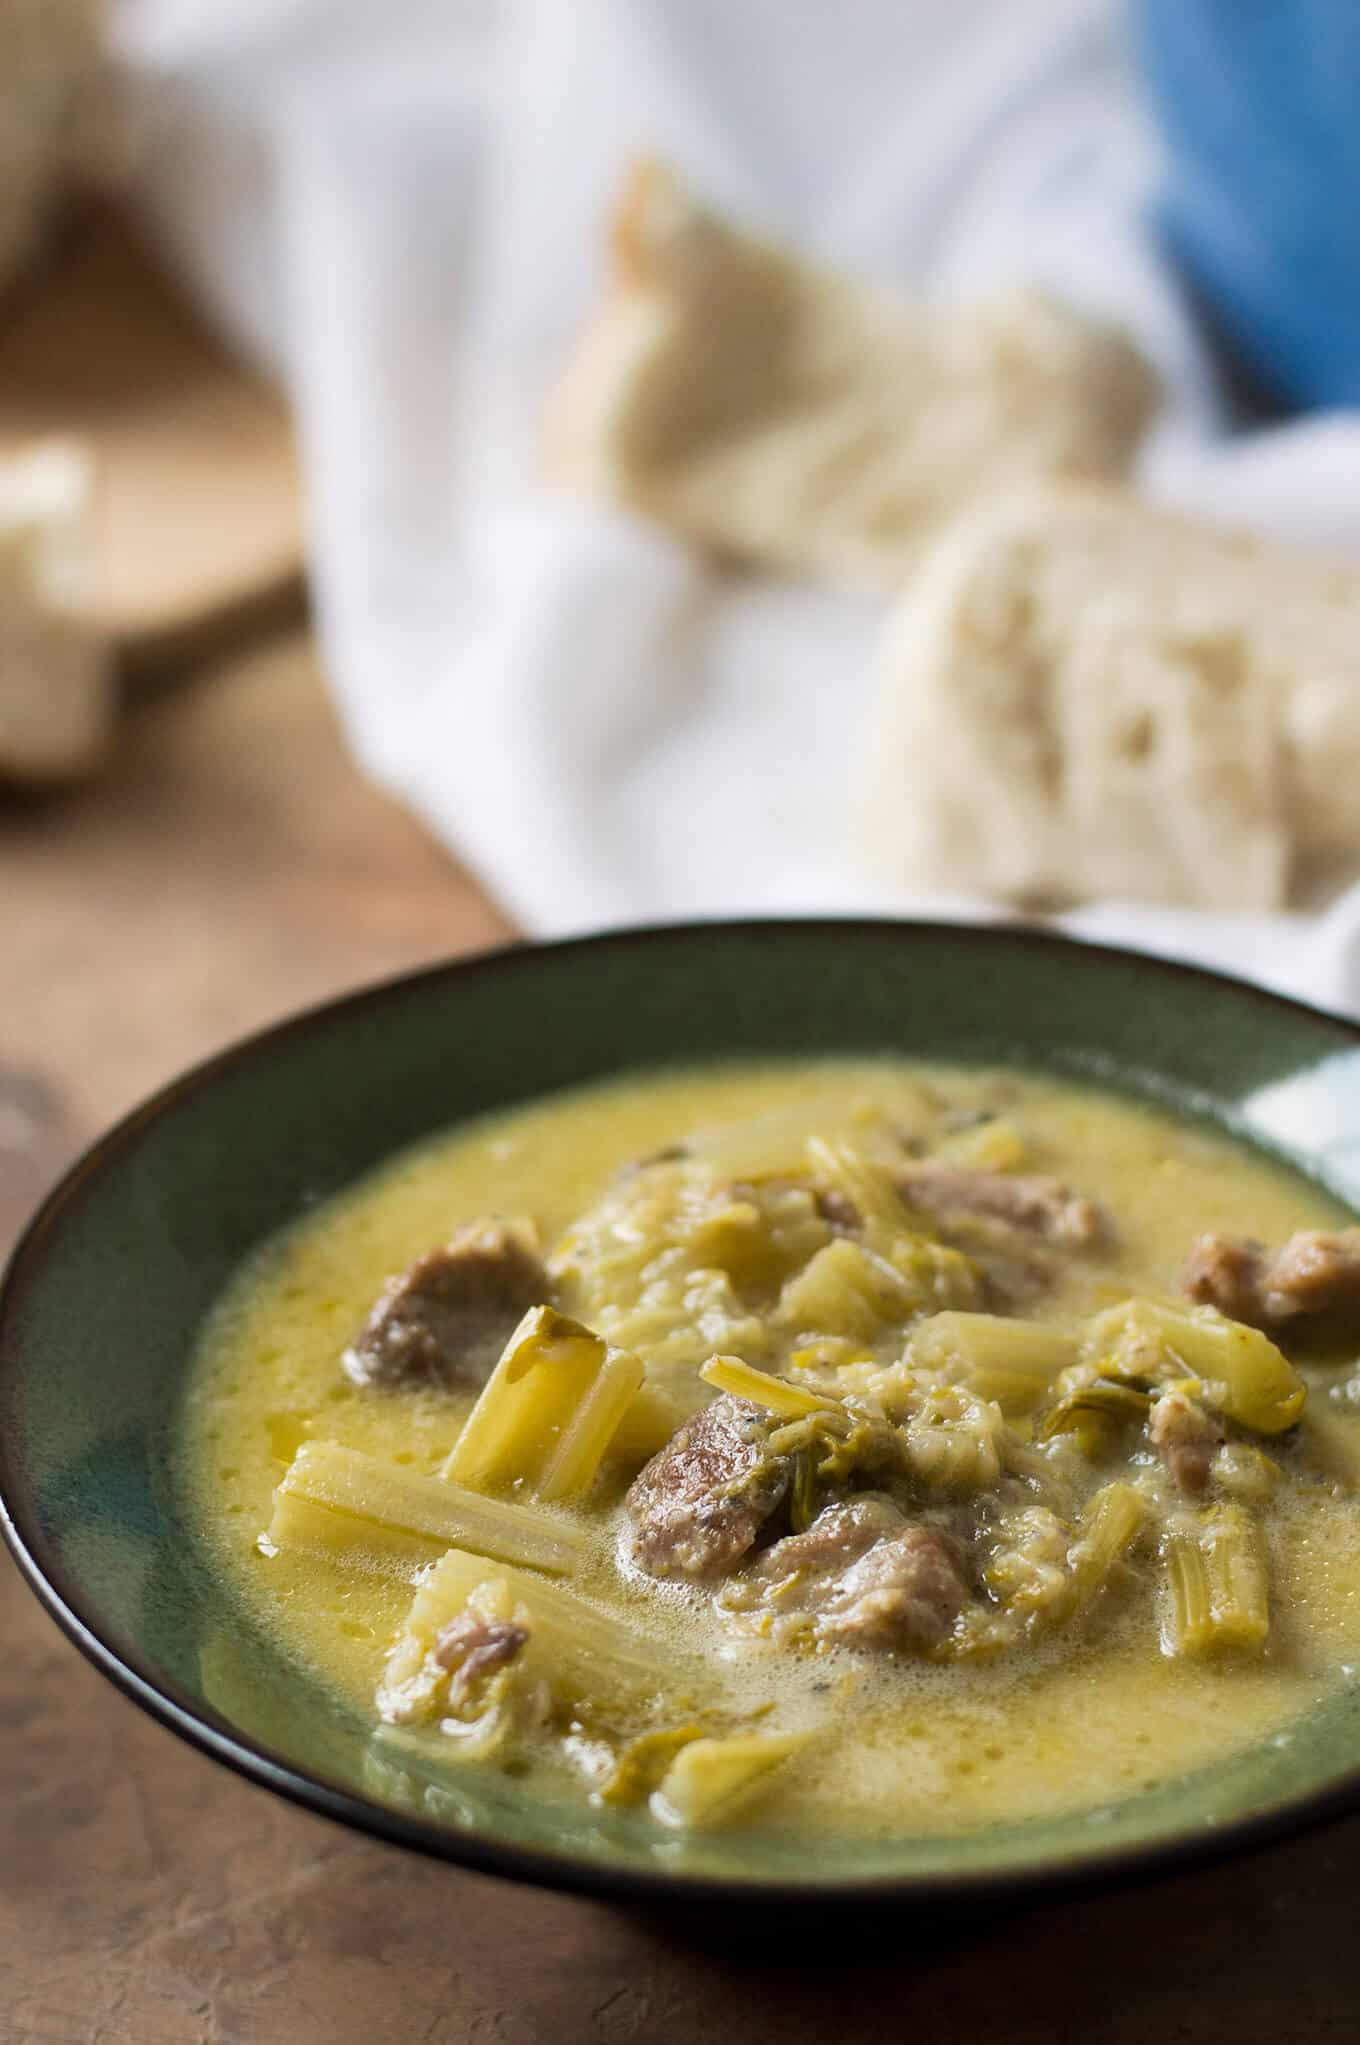 Hoirino me Selino Avgolemono (Pork and Celery Stew with Egg-Lemon Sauce) | omgfood.com